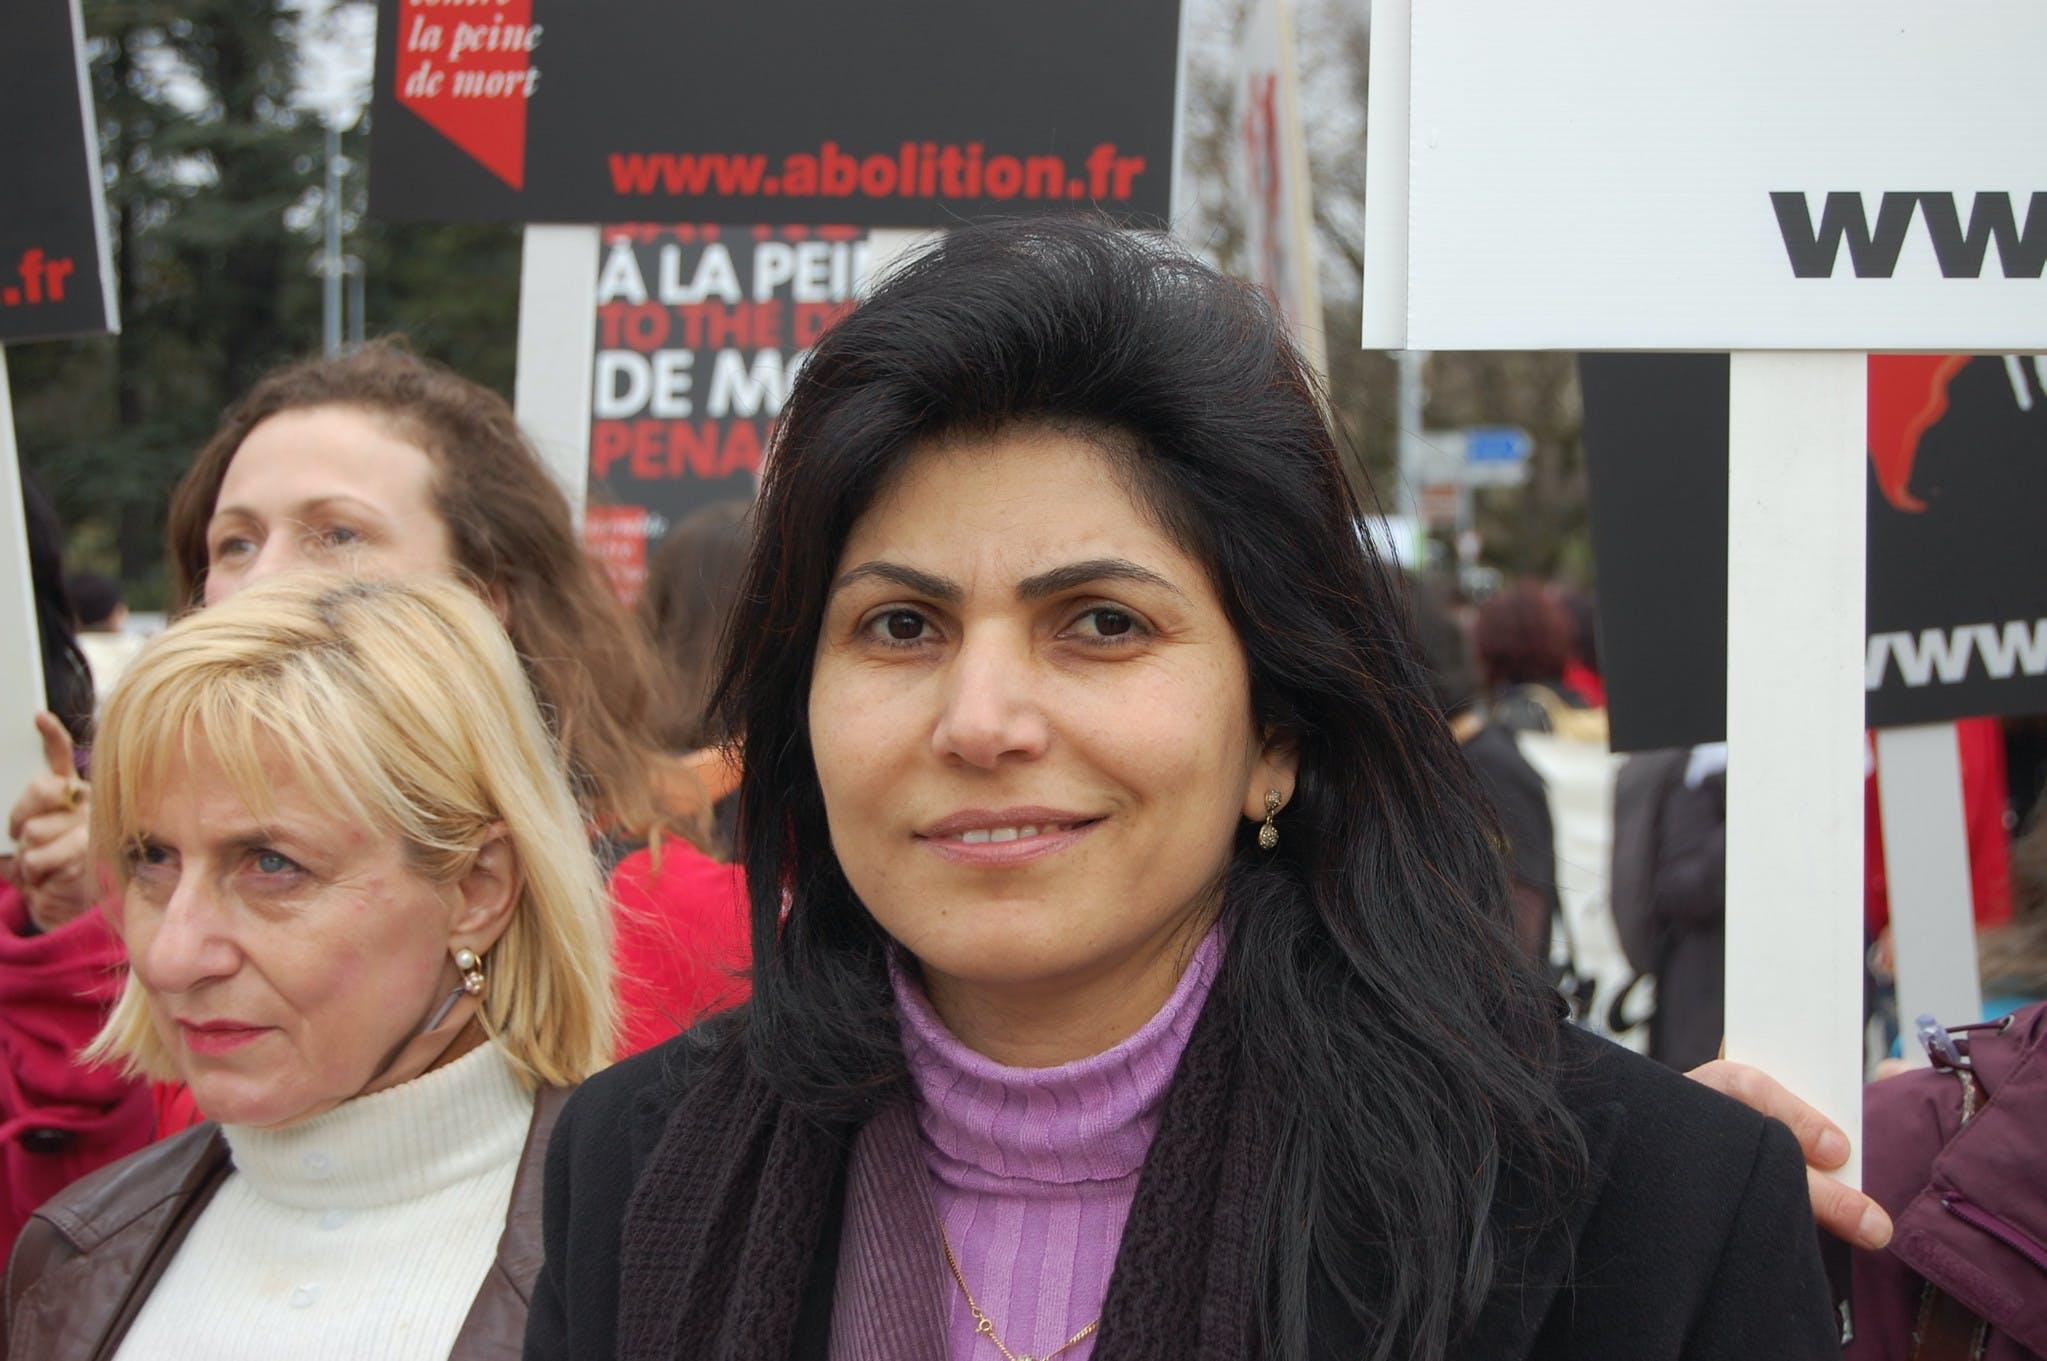 Antoinette Chahine